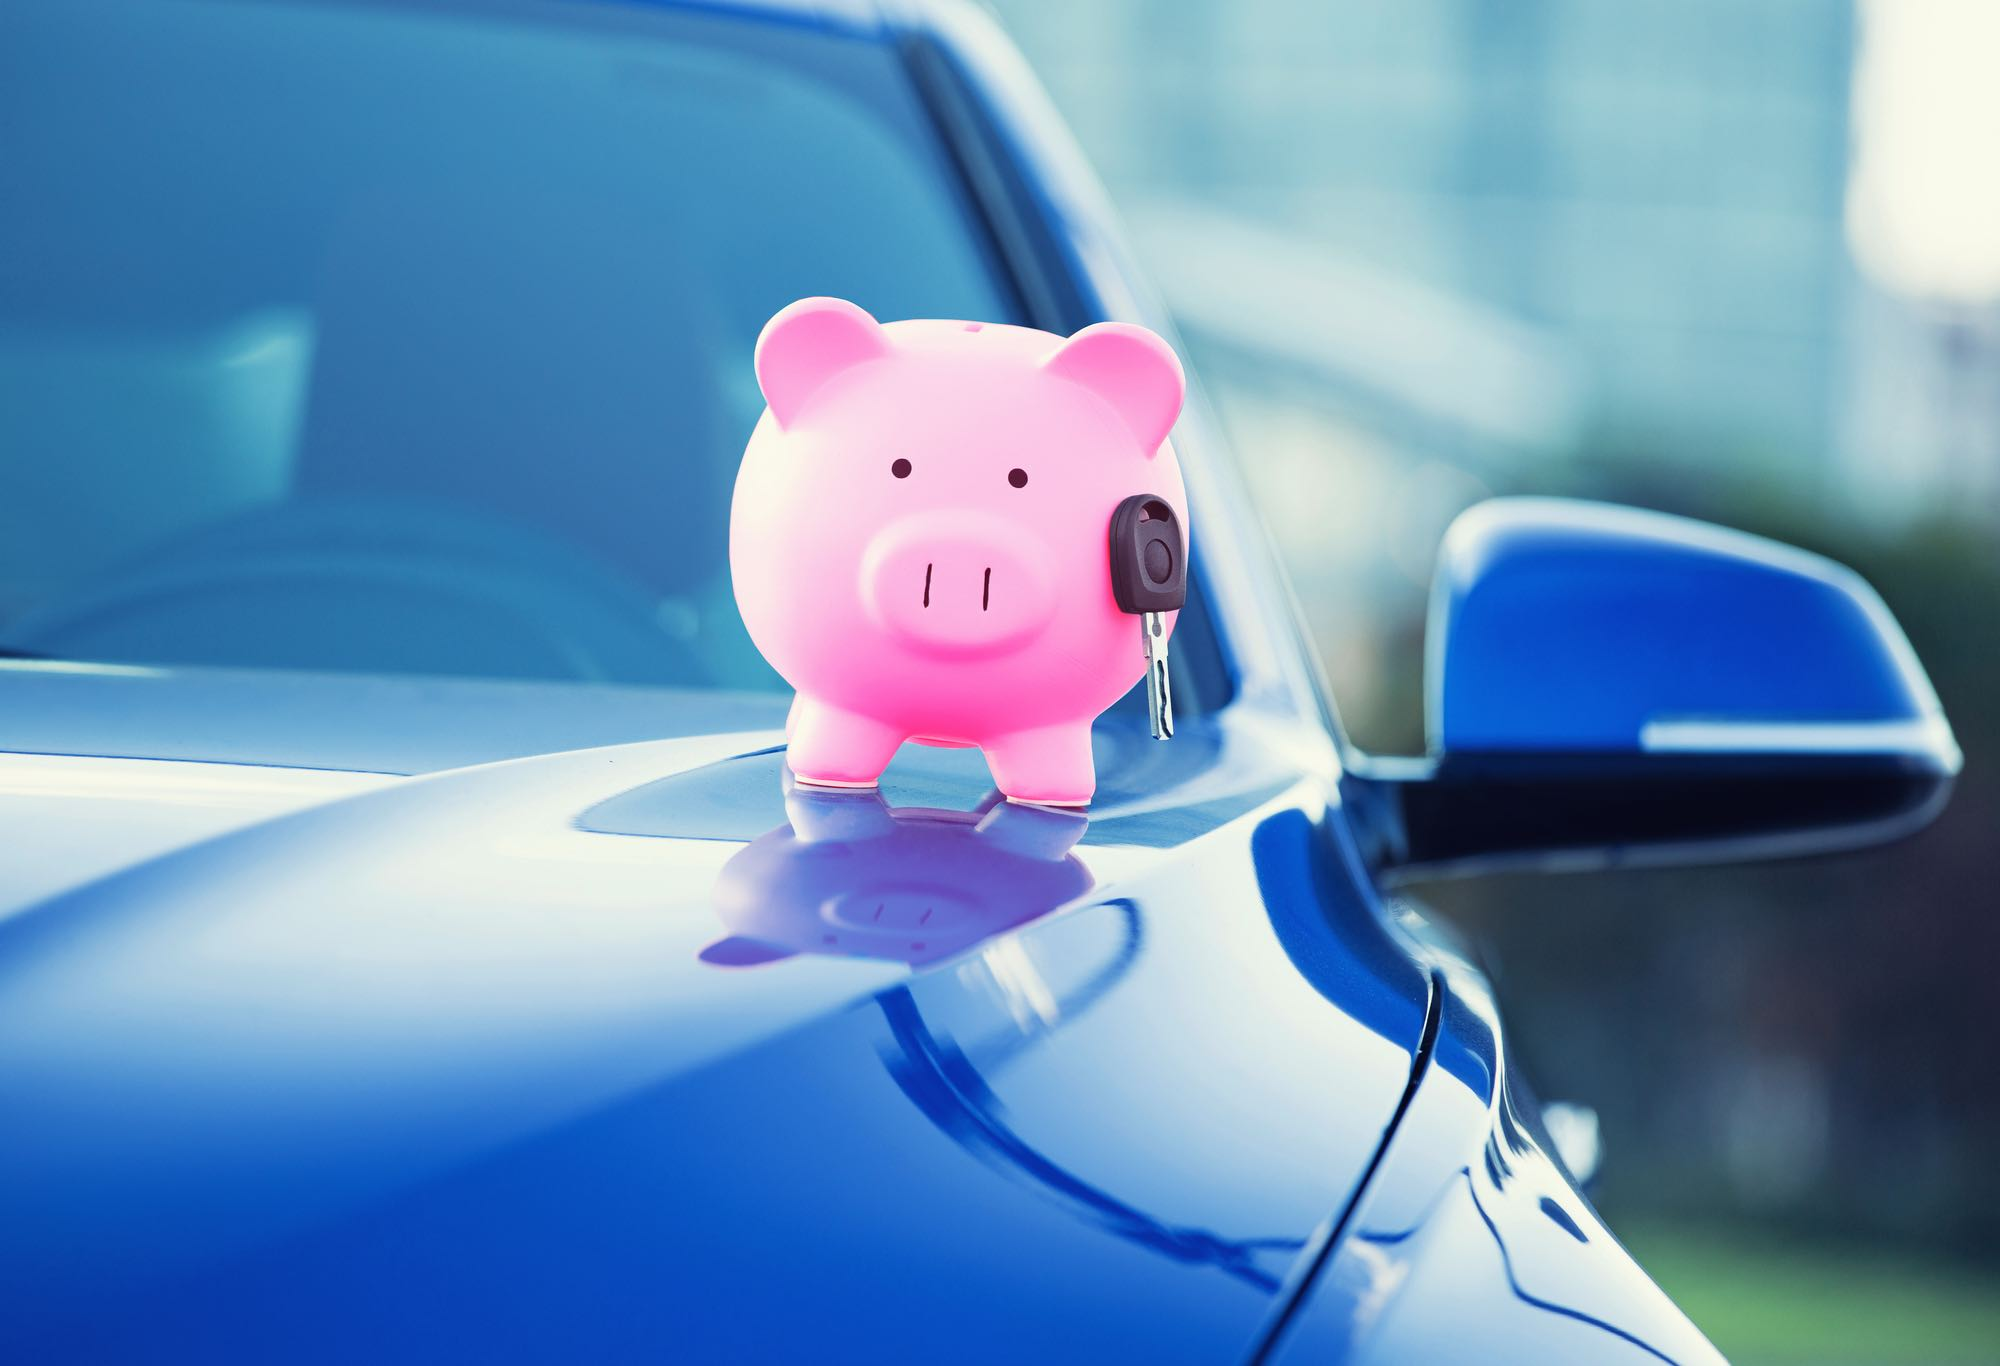 Elektrische Auto Financial Leasen Voordelen Nadelen Elektrischeauto Nl